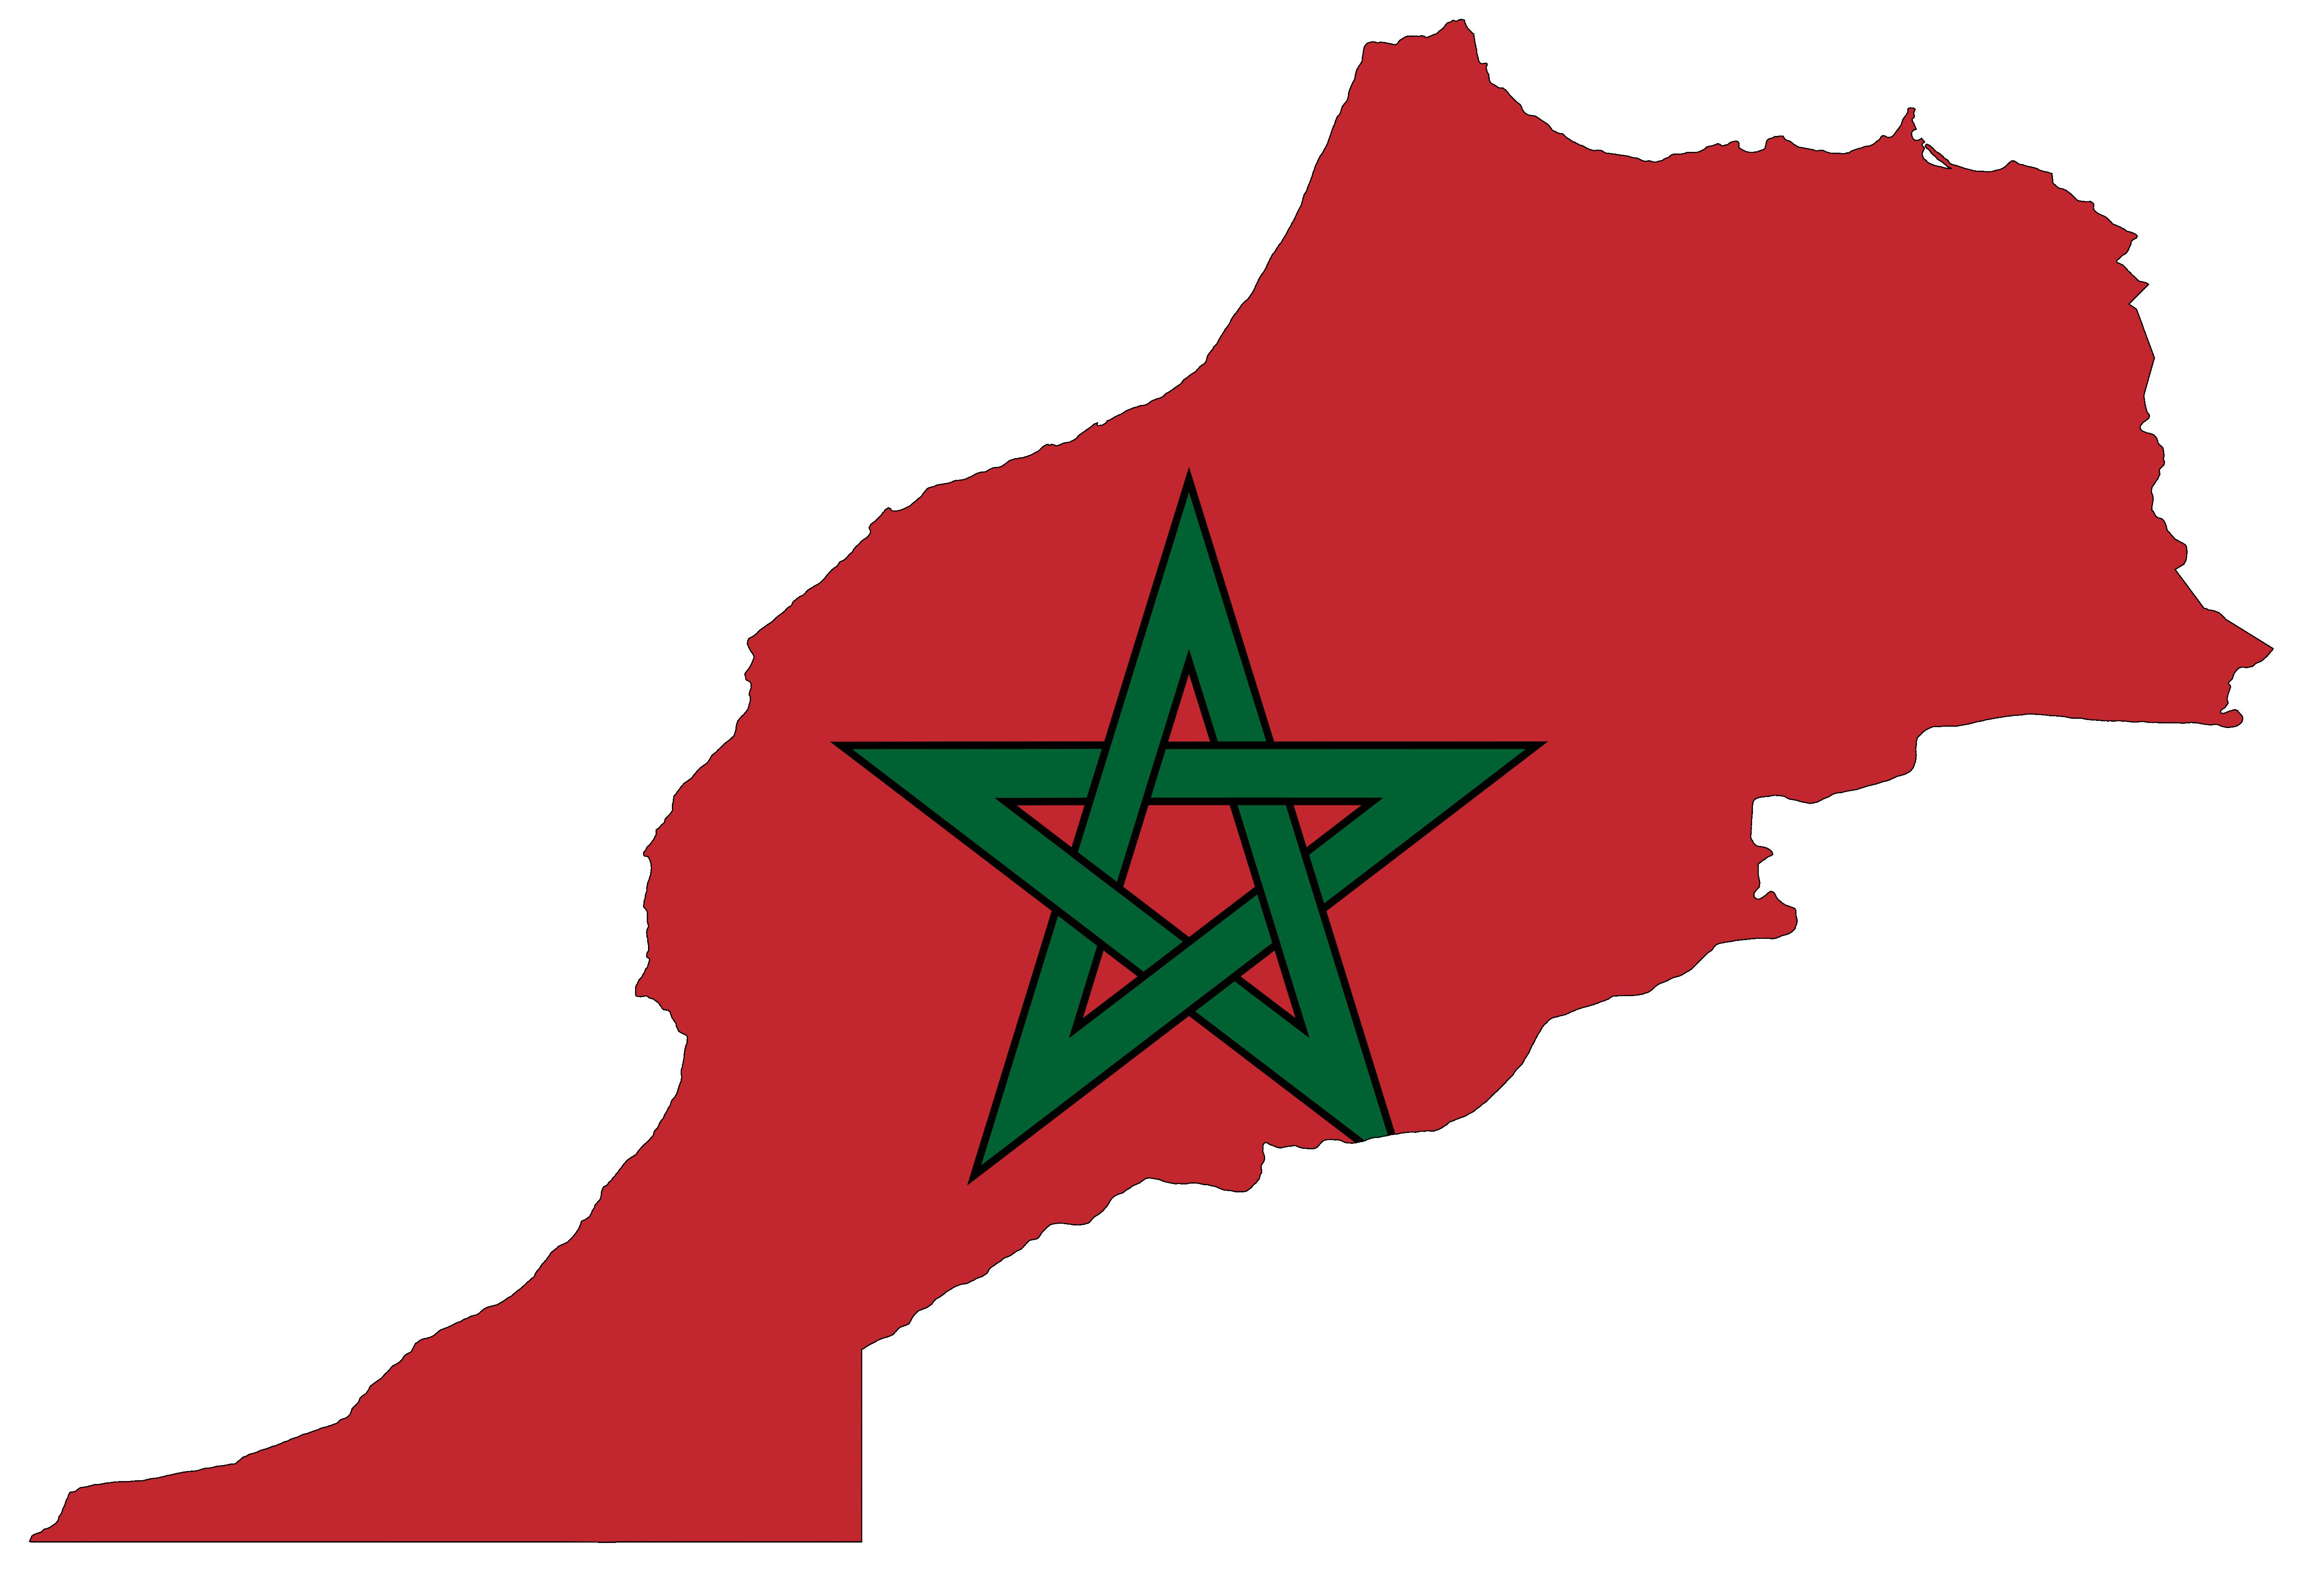 ��� ��� ������ , ������ ������� ������ , ��� ������ ���� ������ 2016 , Morocco new_1422296984_624.p